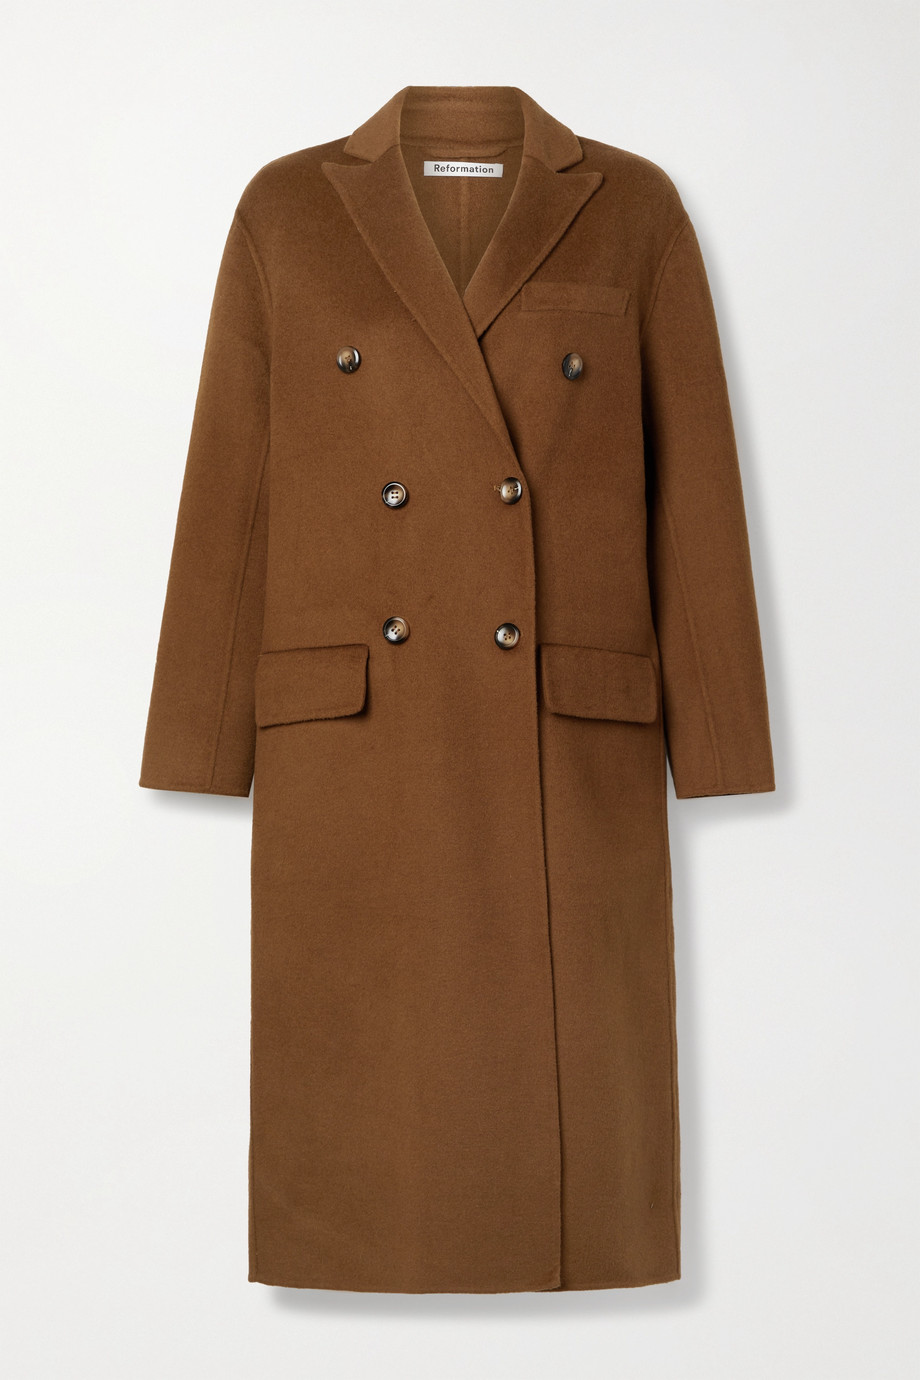 Reformation Hayden double-breasted felt coat